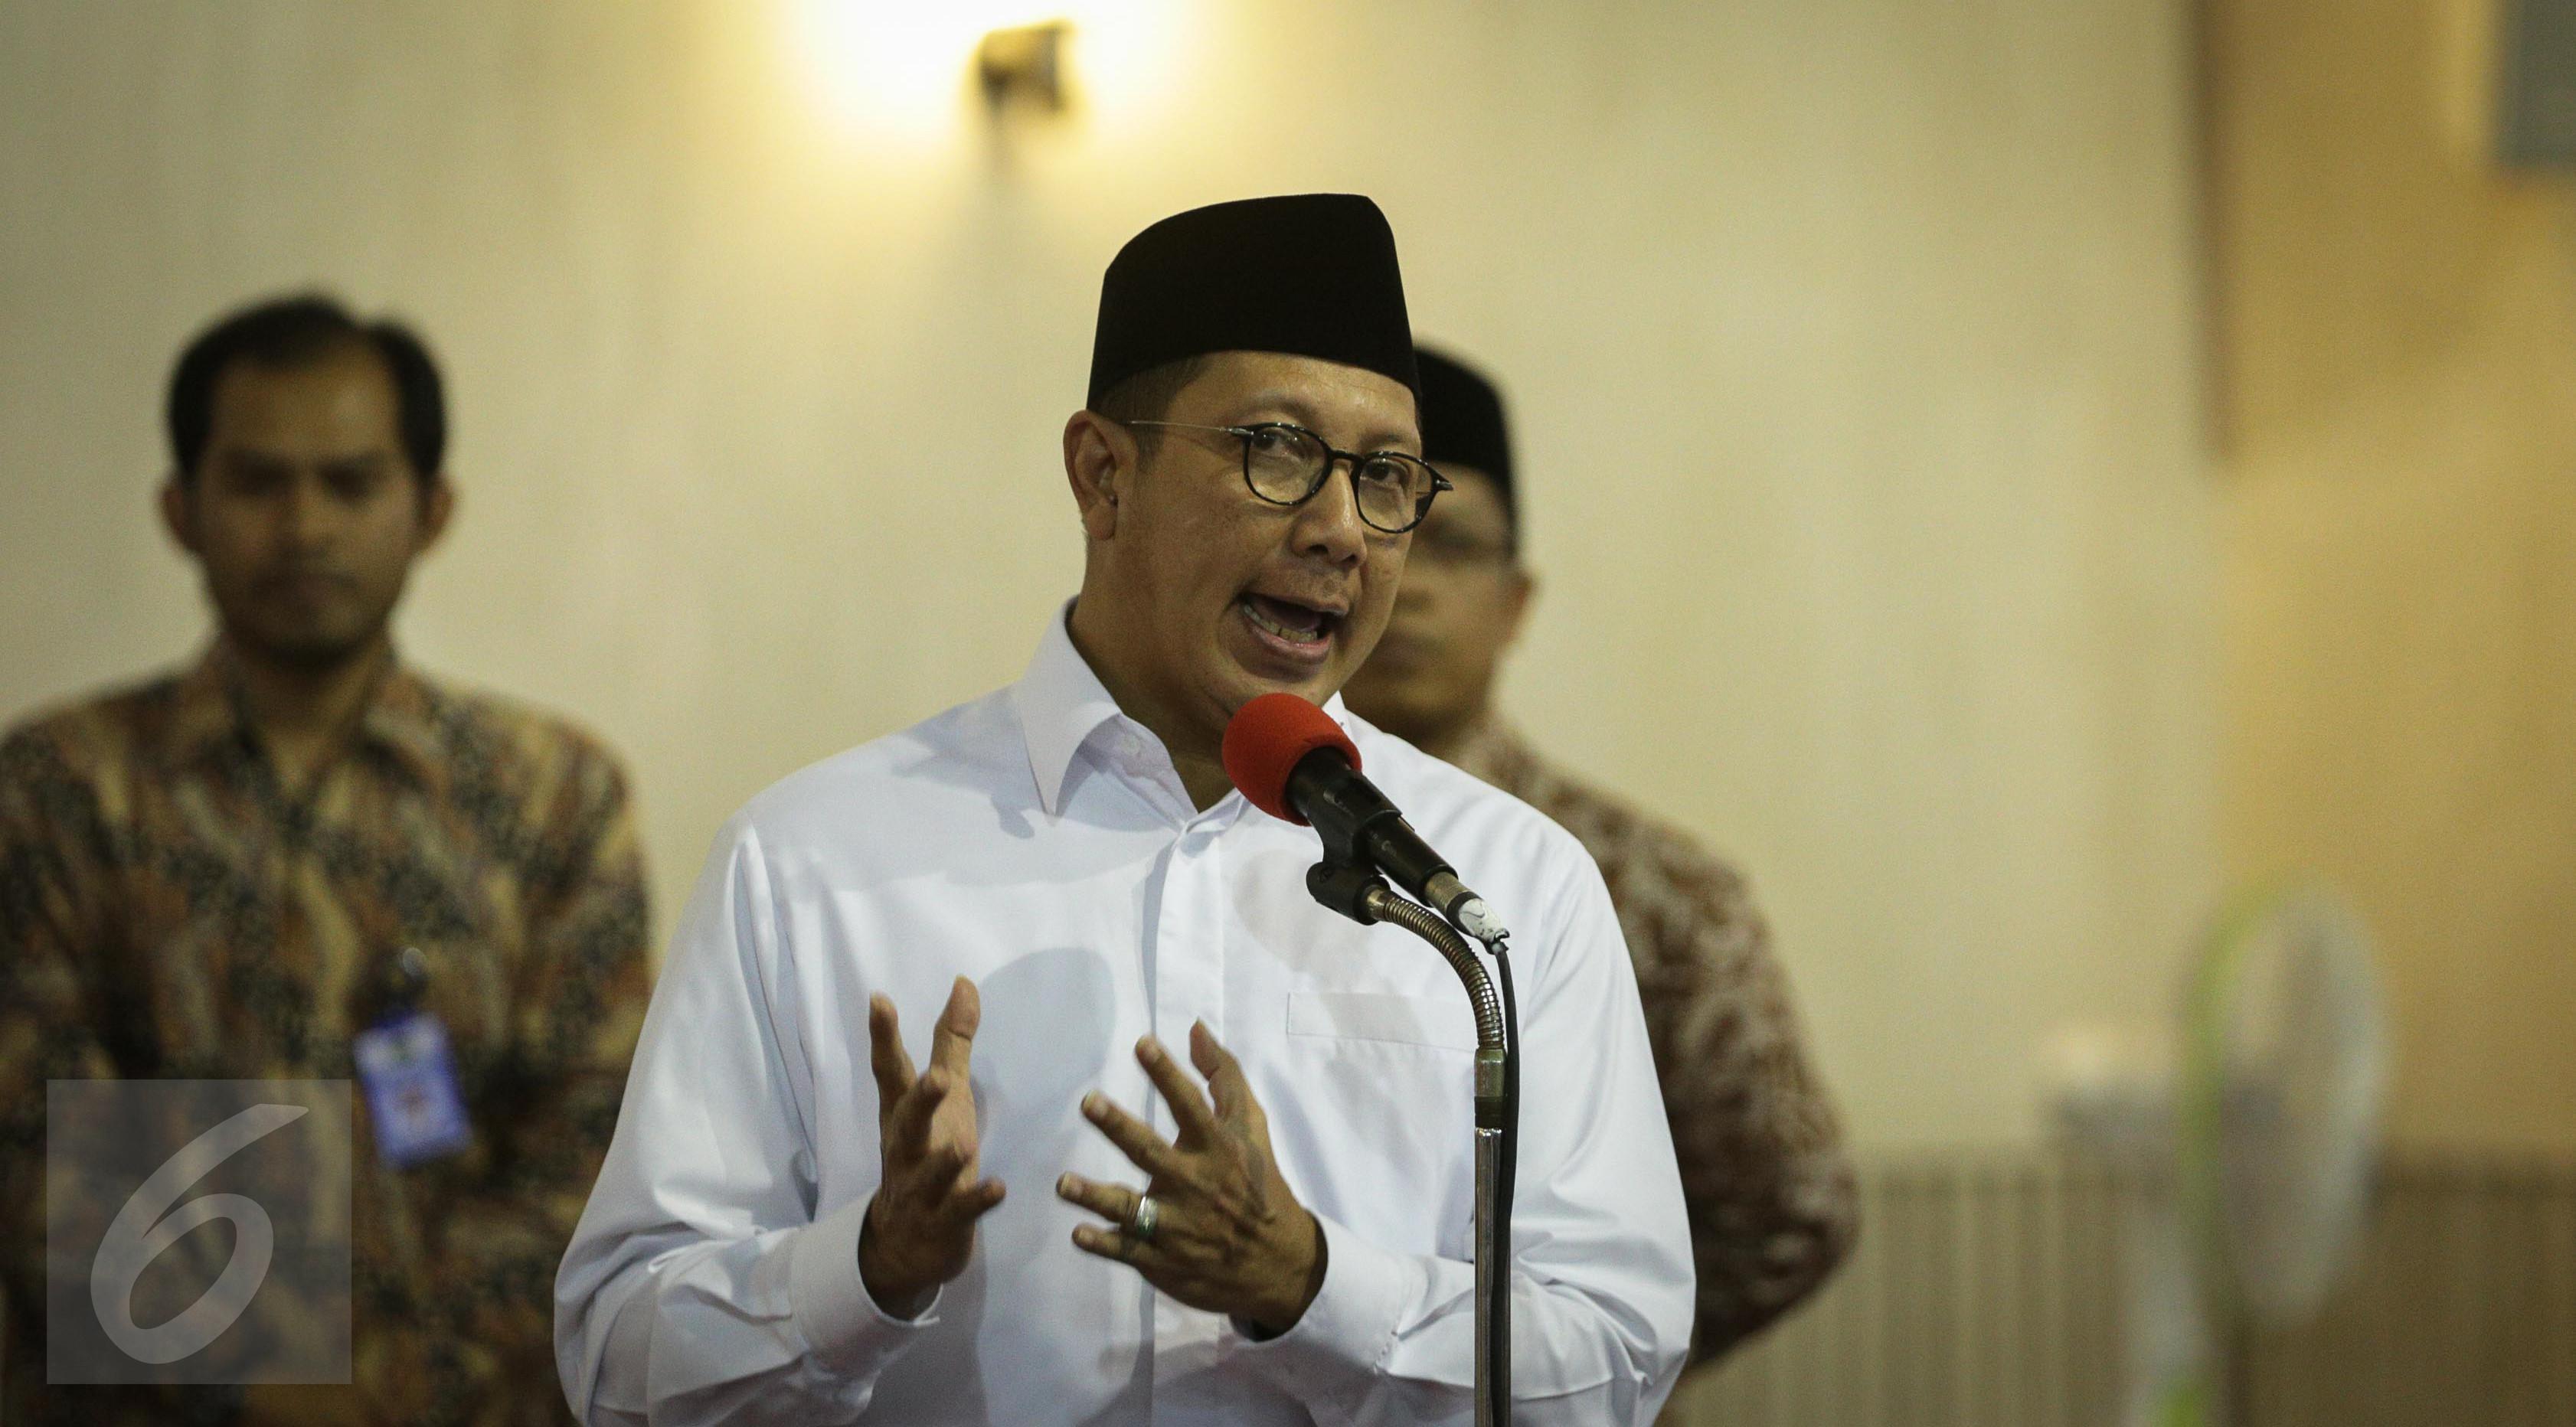 Menteri Agama Lukman Hakim Saifuddin memberikan sambutan saat meresmikan pemajangan potongan Kiswah (kain penutup Kakbah) hadiah dari Raja Salman bin Abdulaziz Al Saud di Masjid Istiqlal, Jakarta, Jumat (10/3). (Liputan6.com/Faizal Fanani)